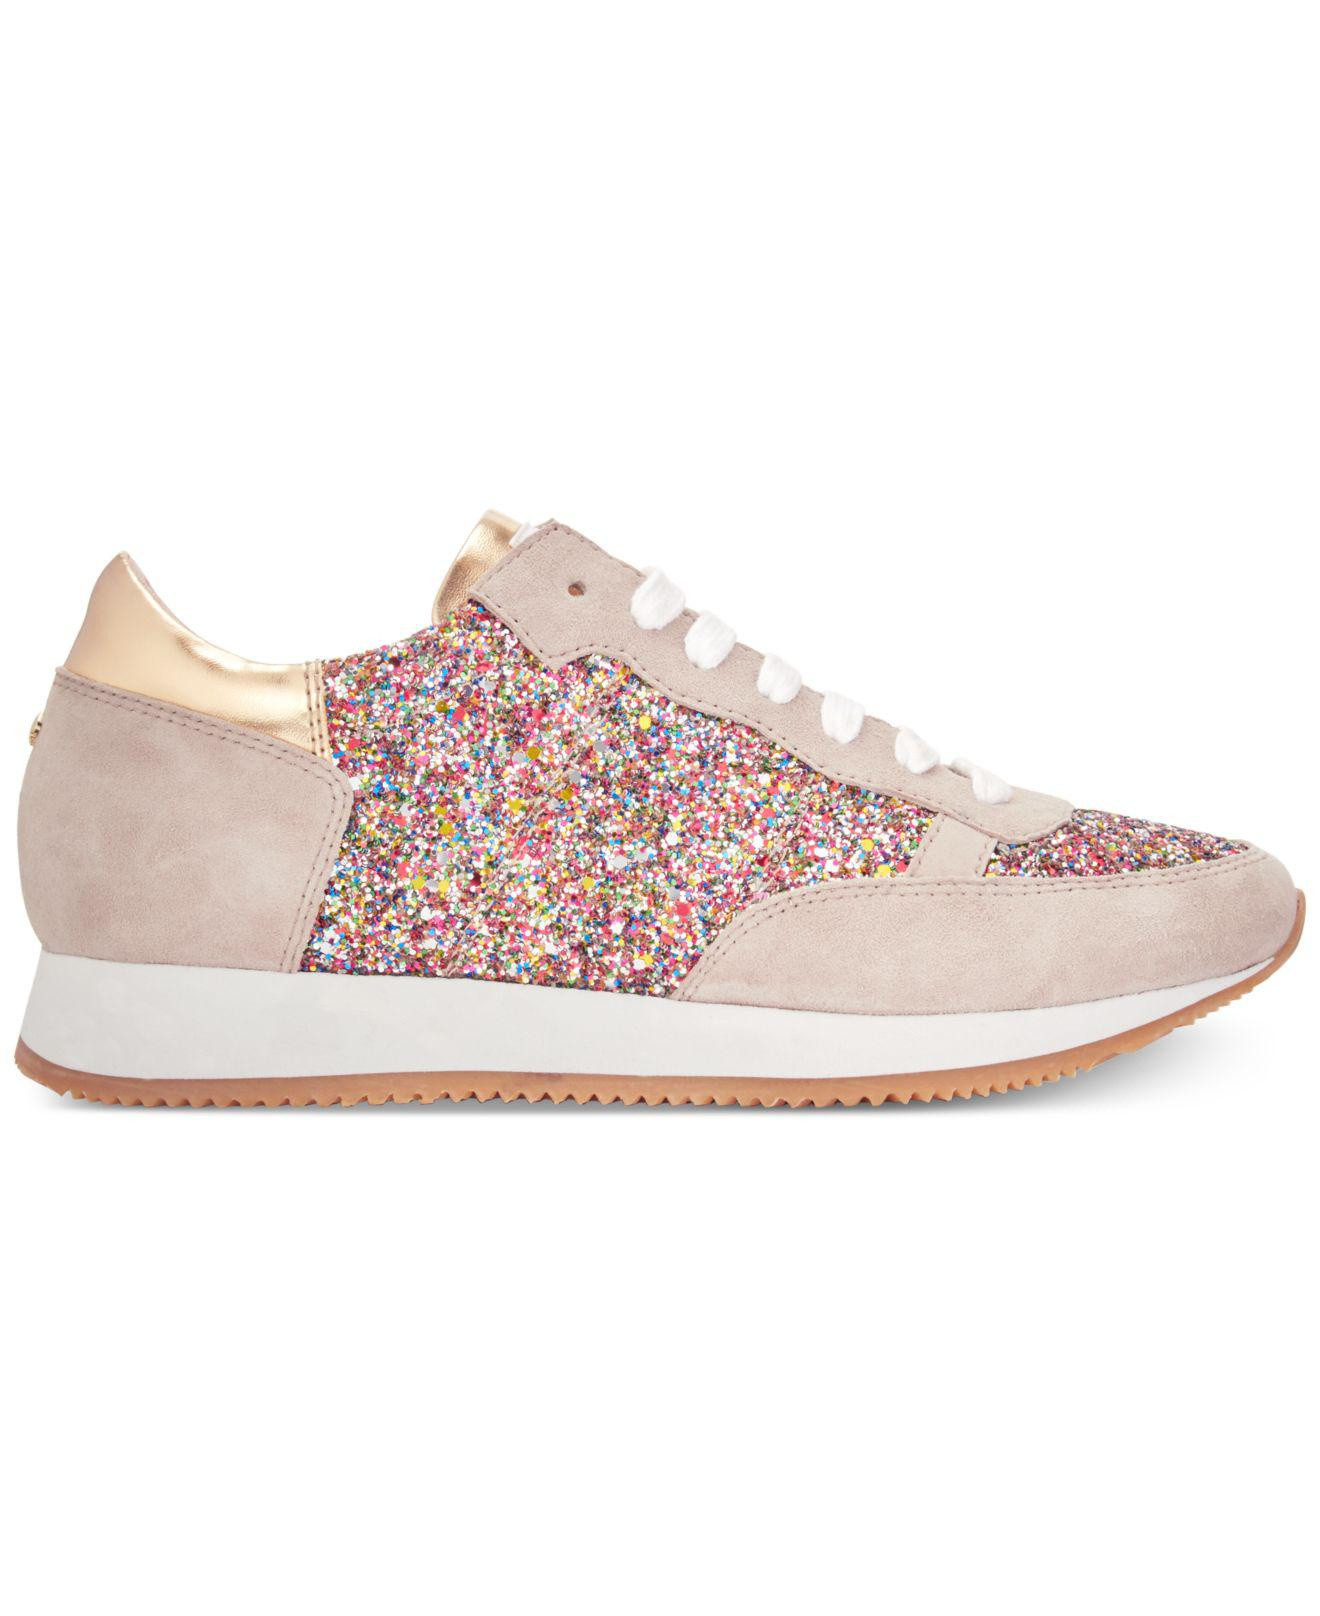 0c12883137b8 Lyst - Kate Spade Felicia Fashion Sneakers